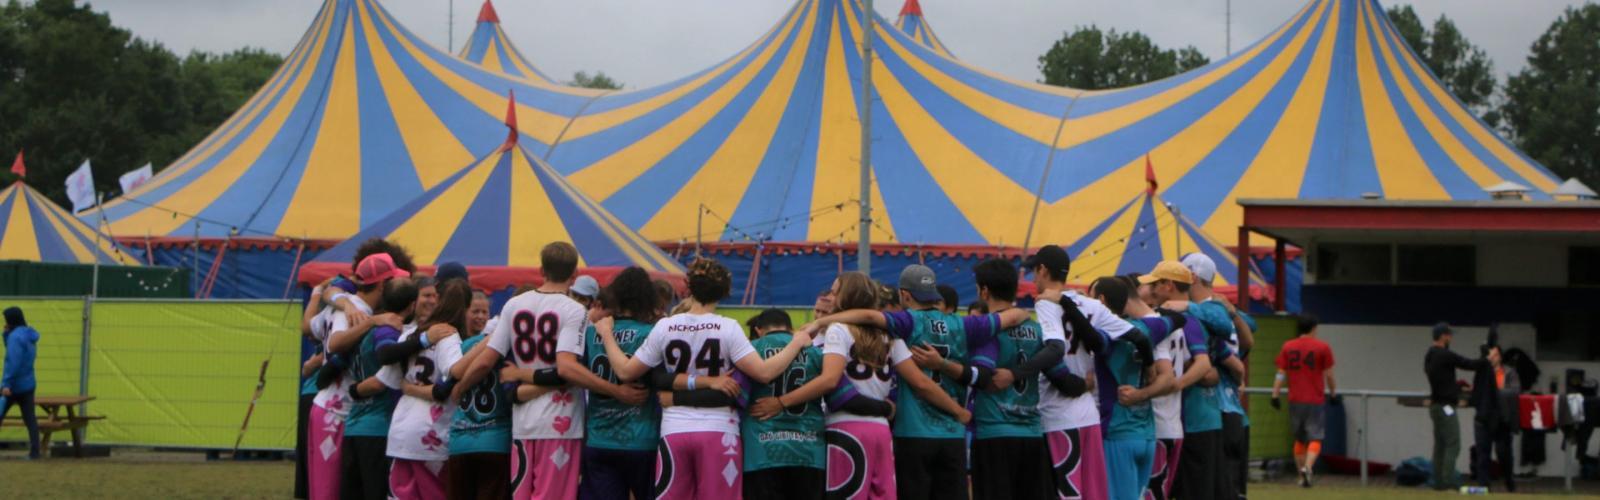 windmill_tournament_spirit_circle_frisbee